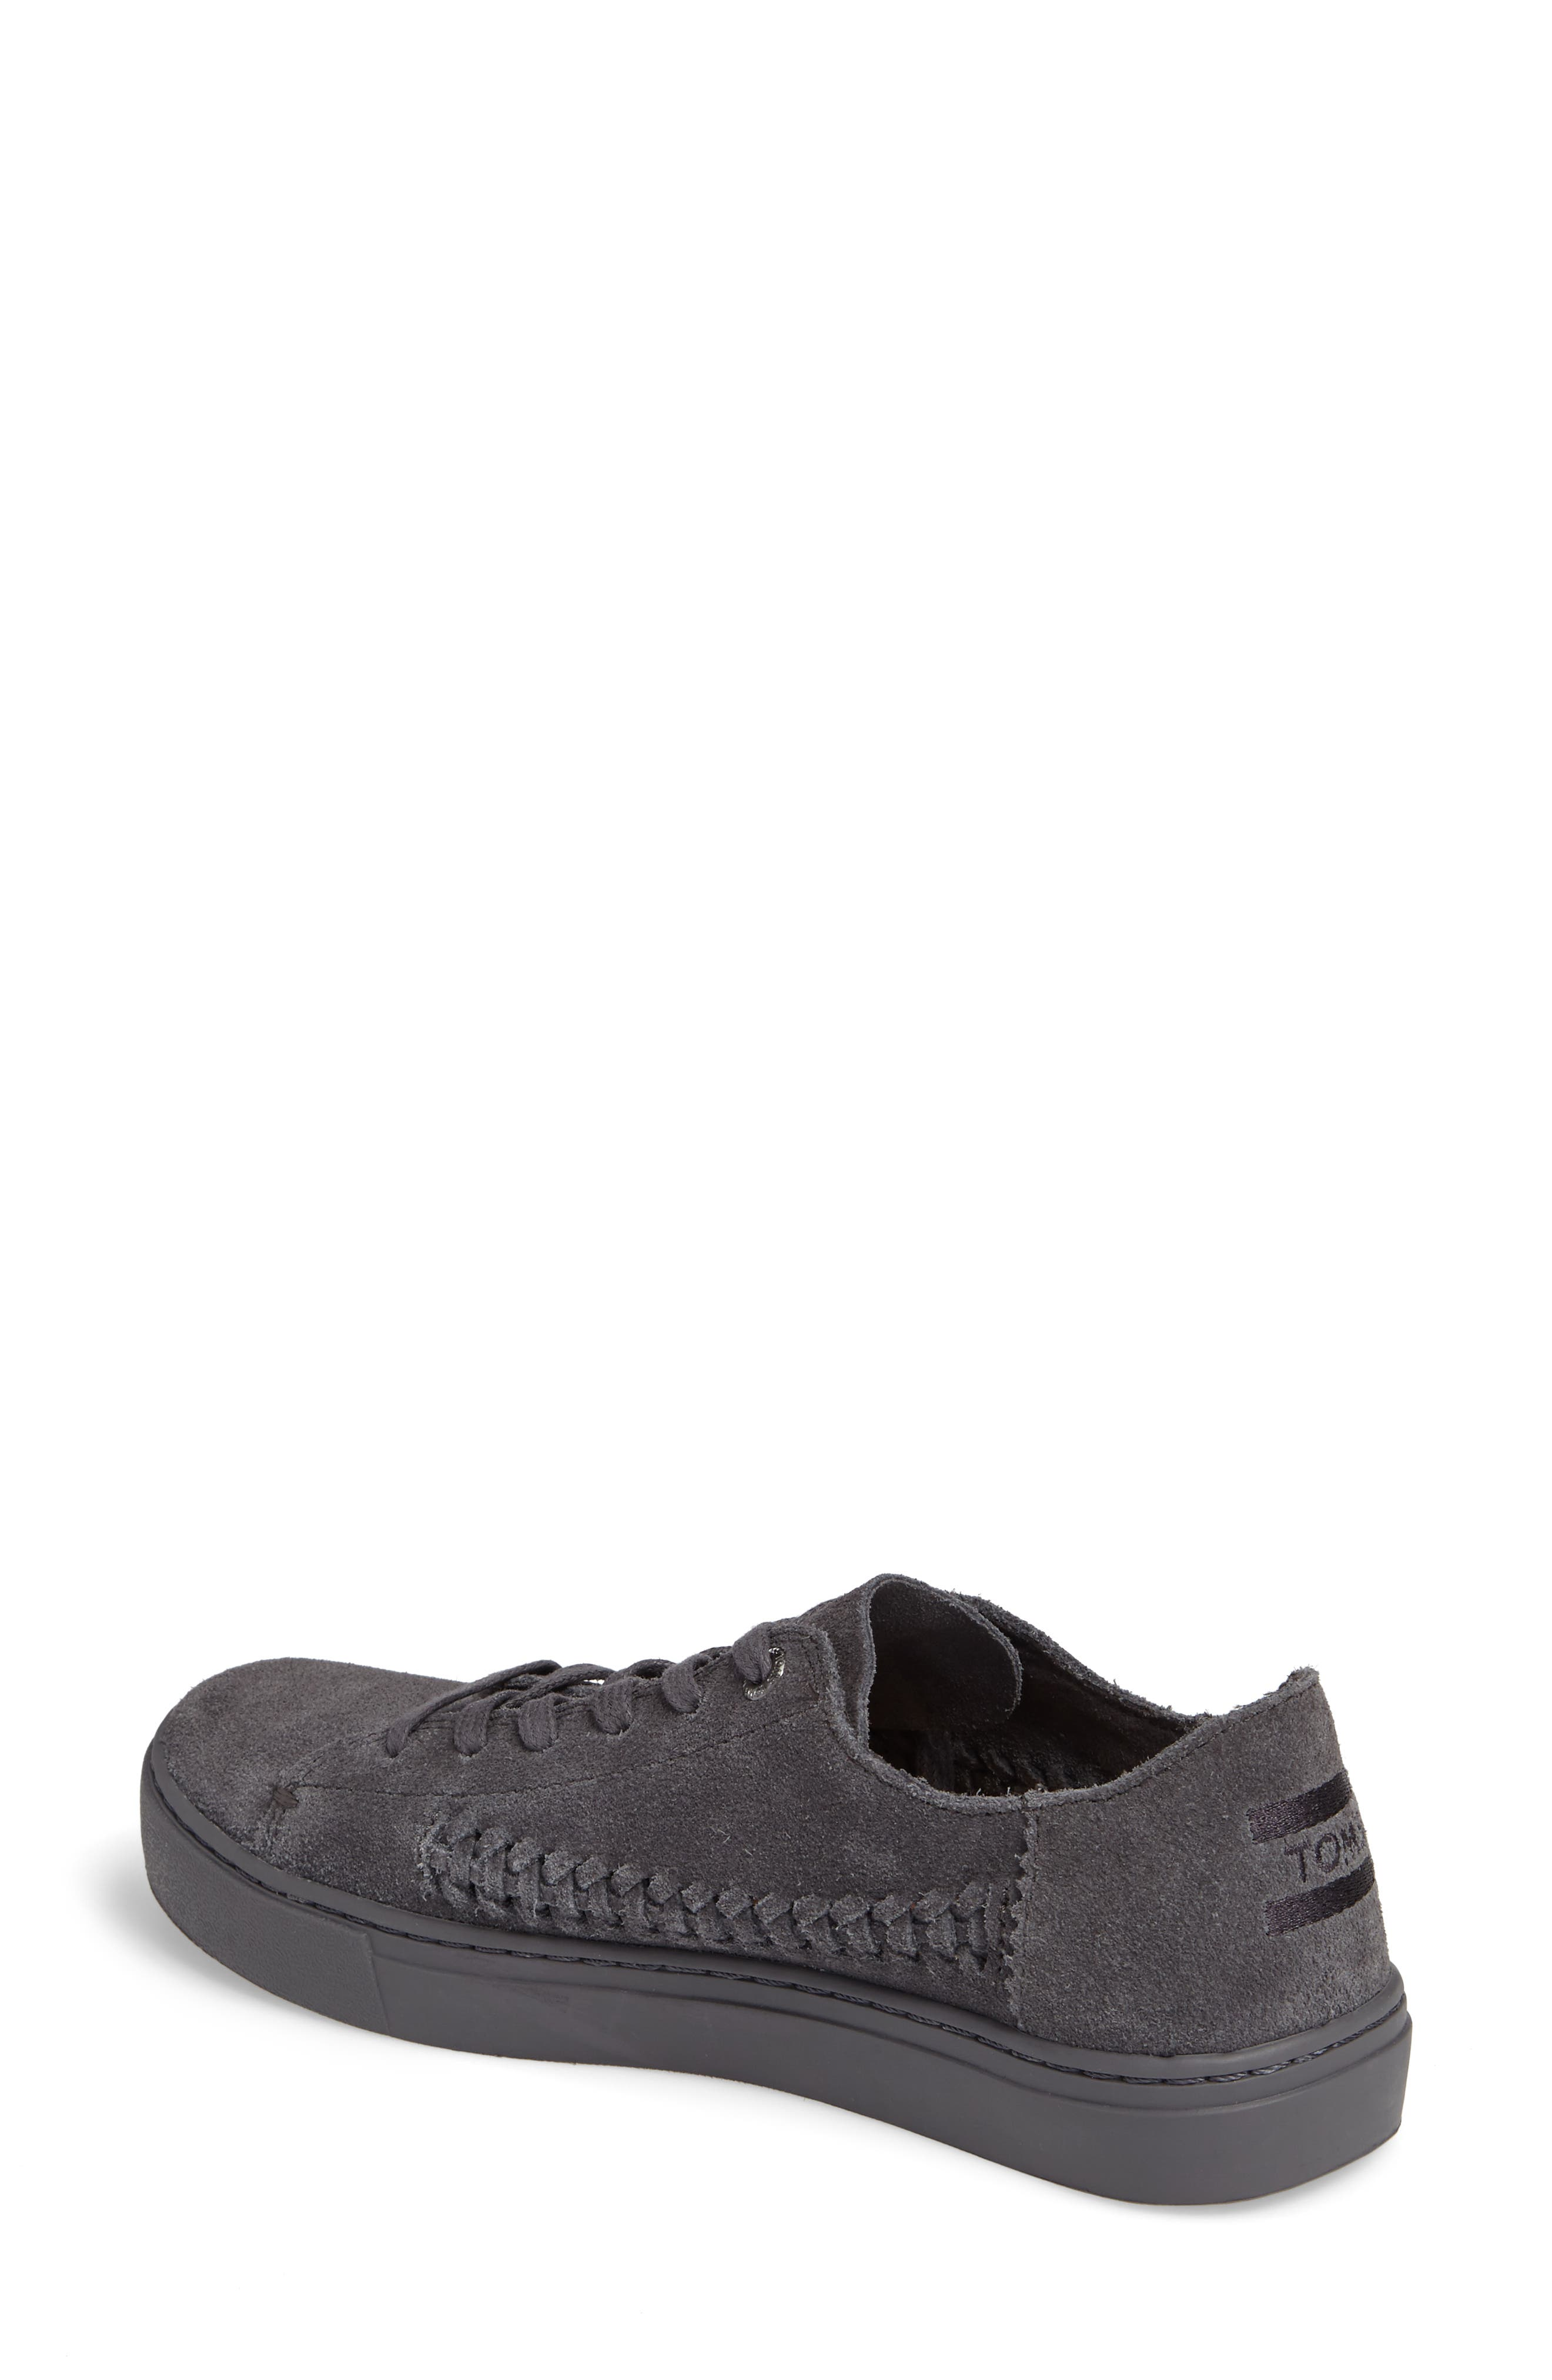 Lenox Sneaker,                             Alternate thumbnail 19, color,